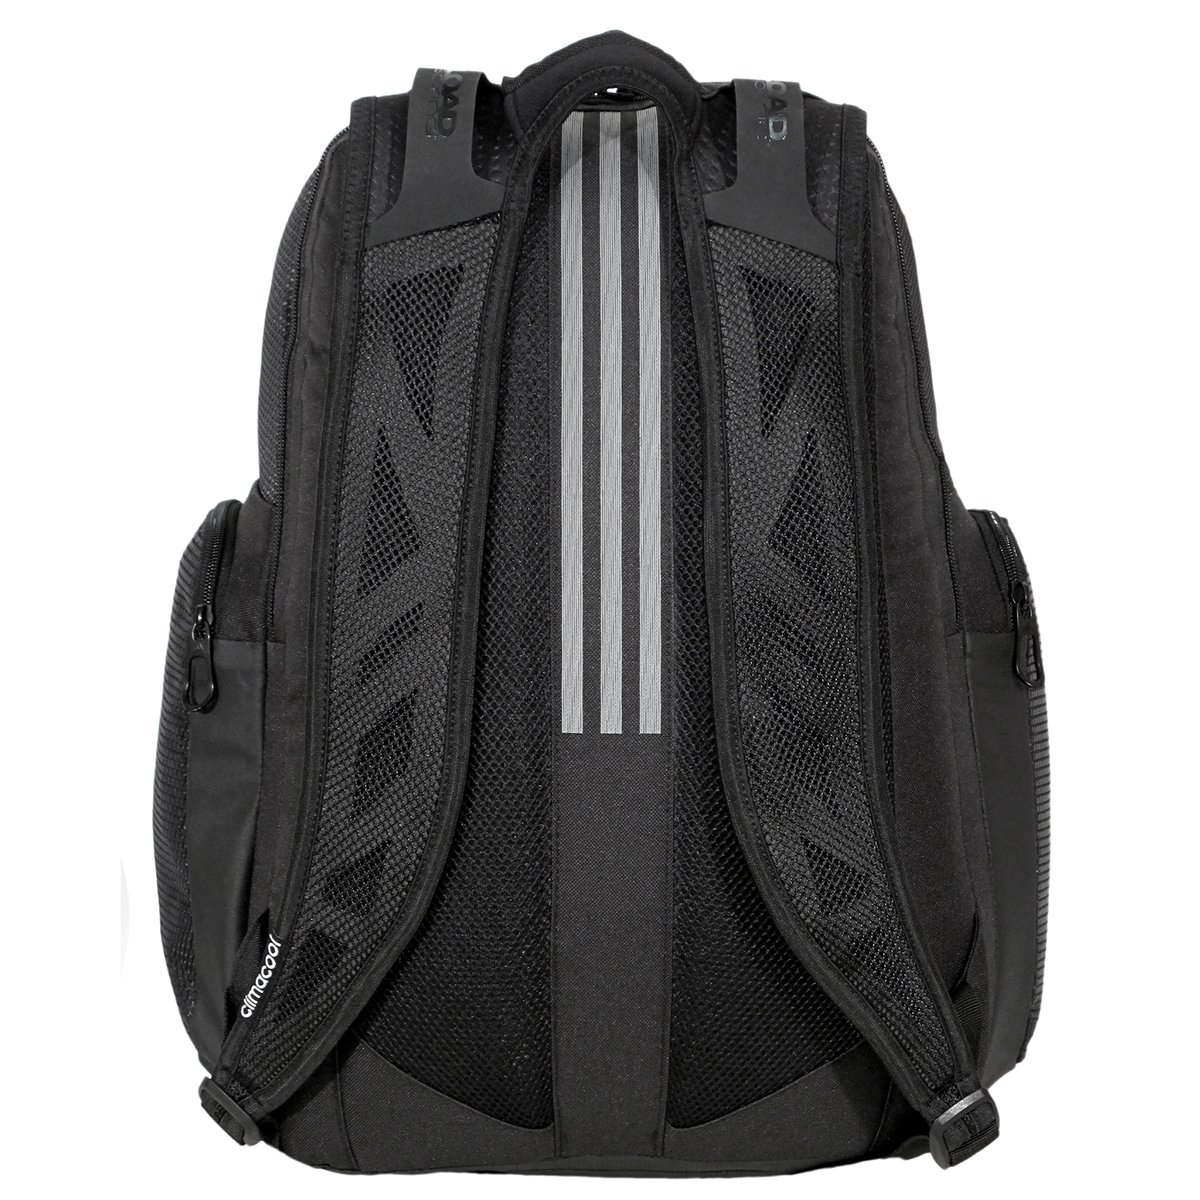 b17ed2e9ea98 Amazon.com  adidas Climacool Strength Backpack